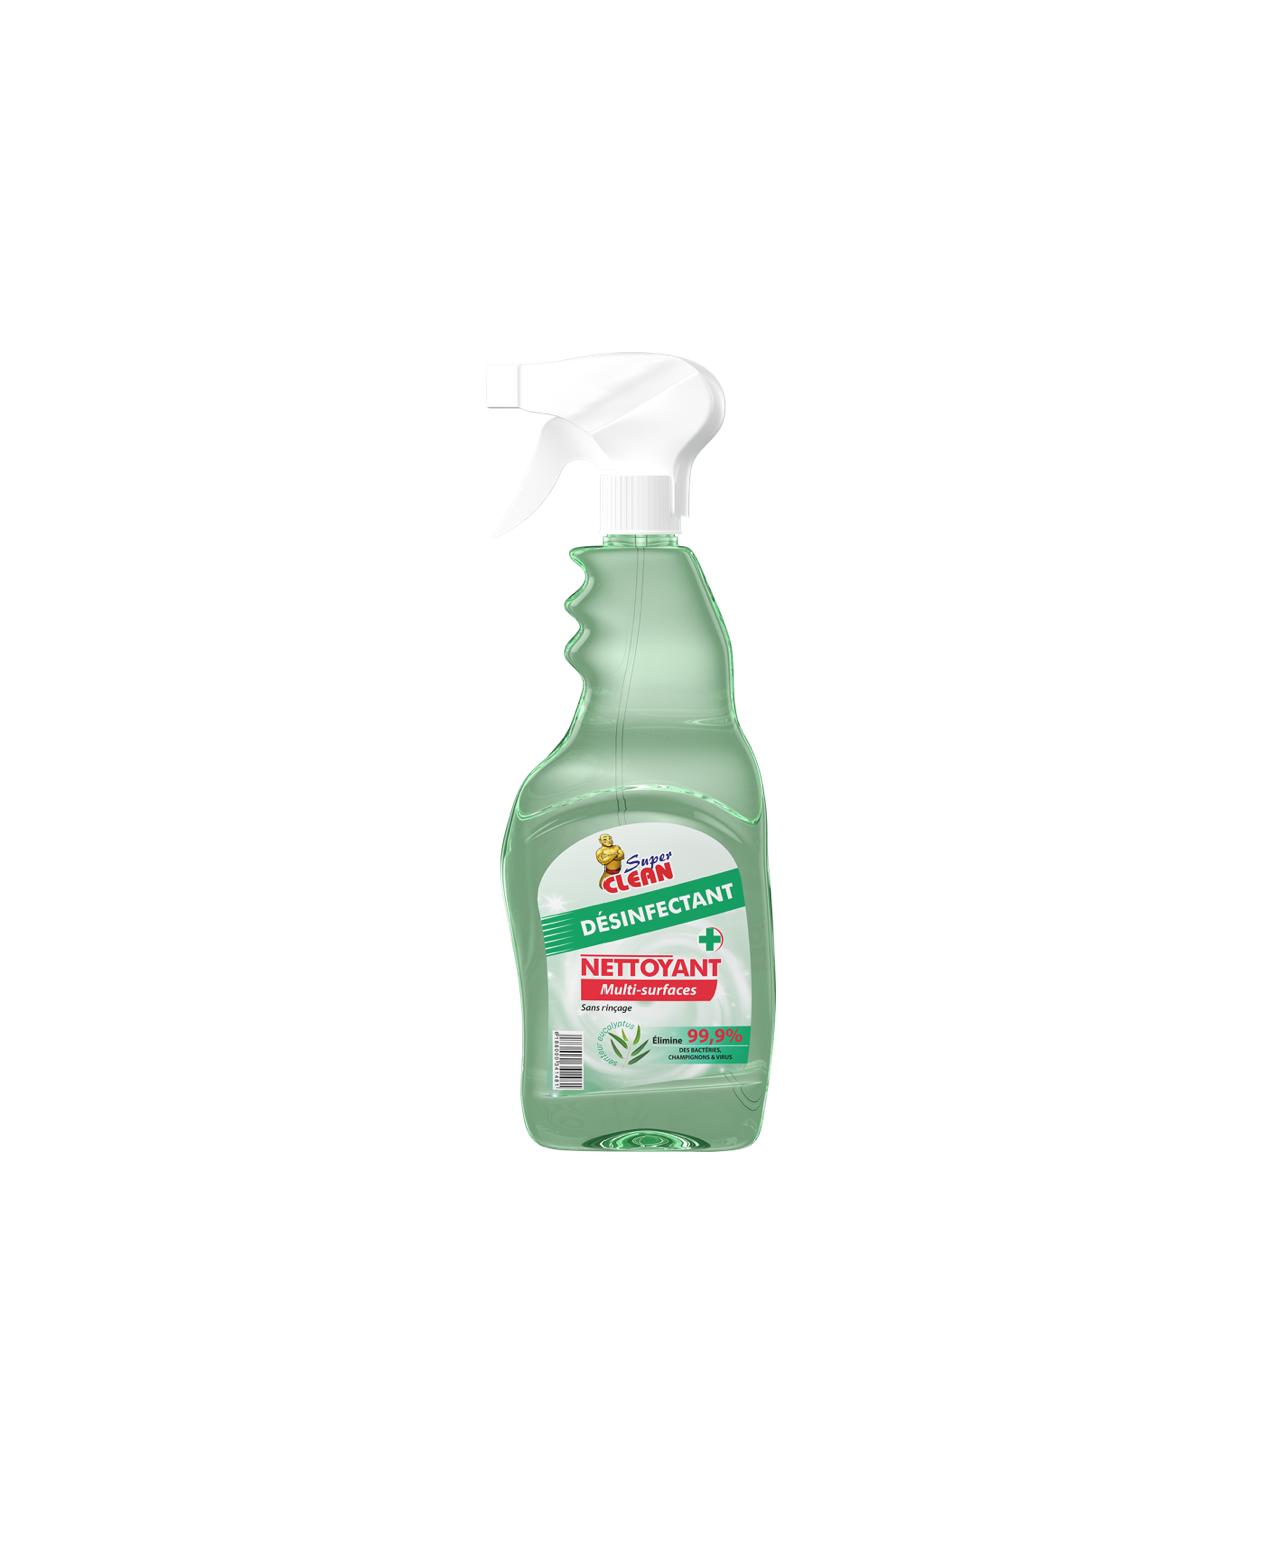 SUPER CLEAN_DESINFECTANT 800ml_Siprochim